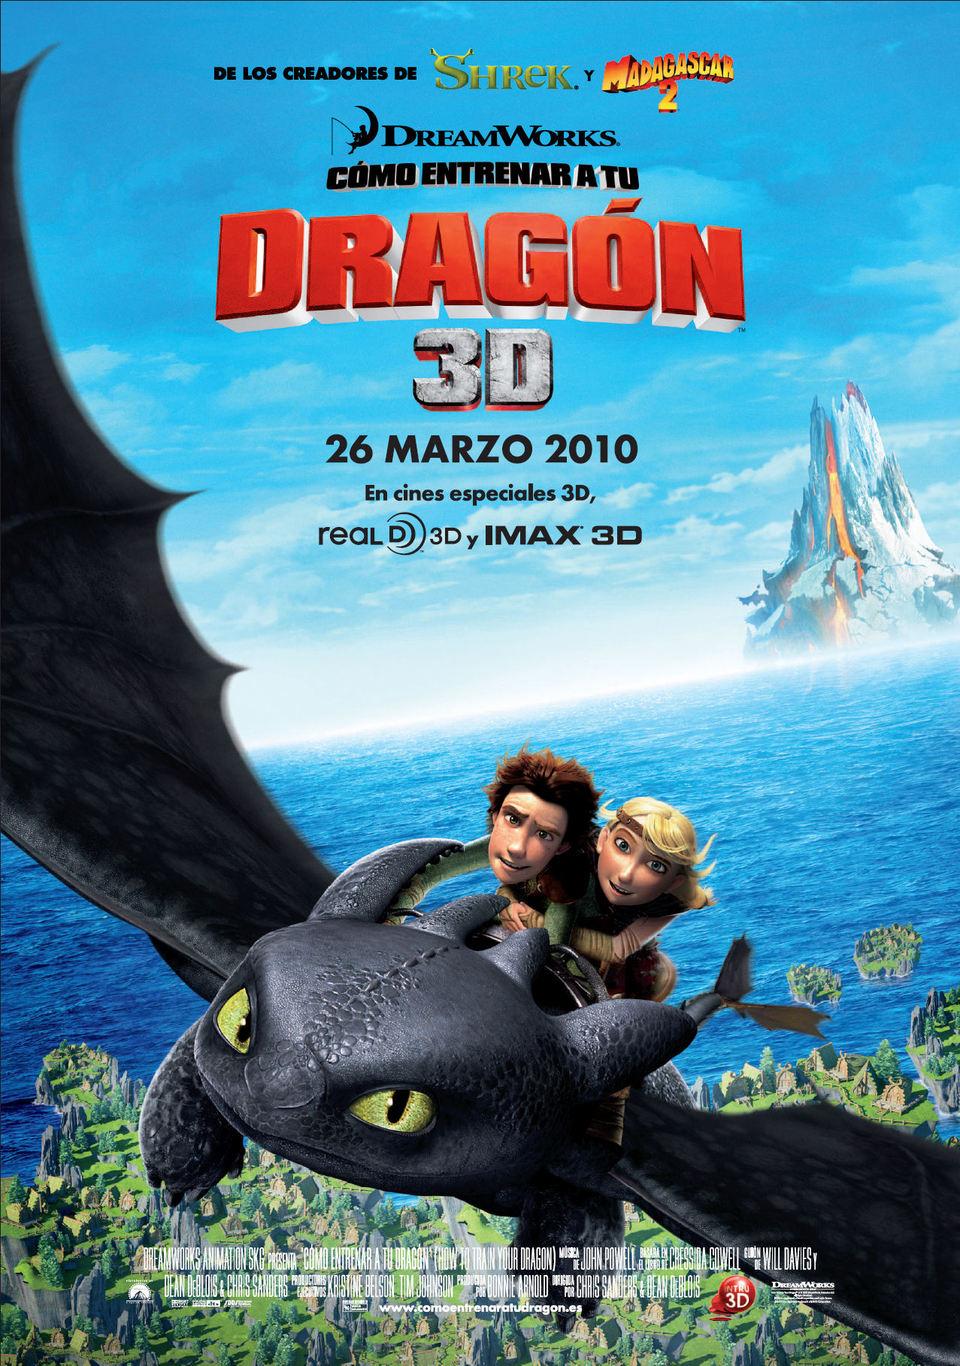 http://descubrepelis.blogspot.com/2012/02/como-entrenar-tu-dragon.html